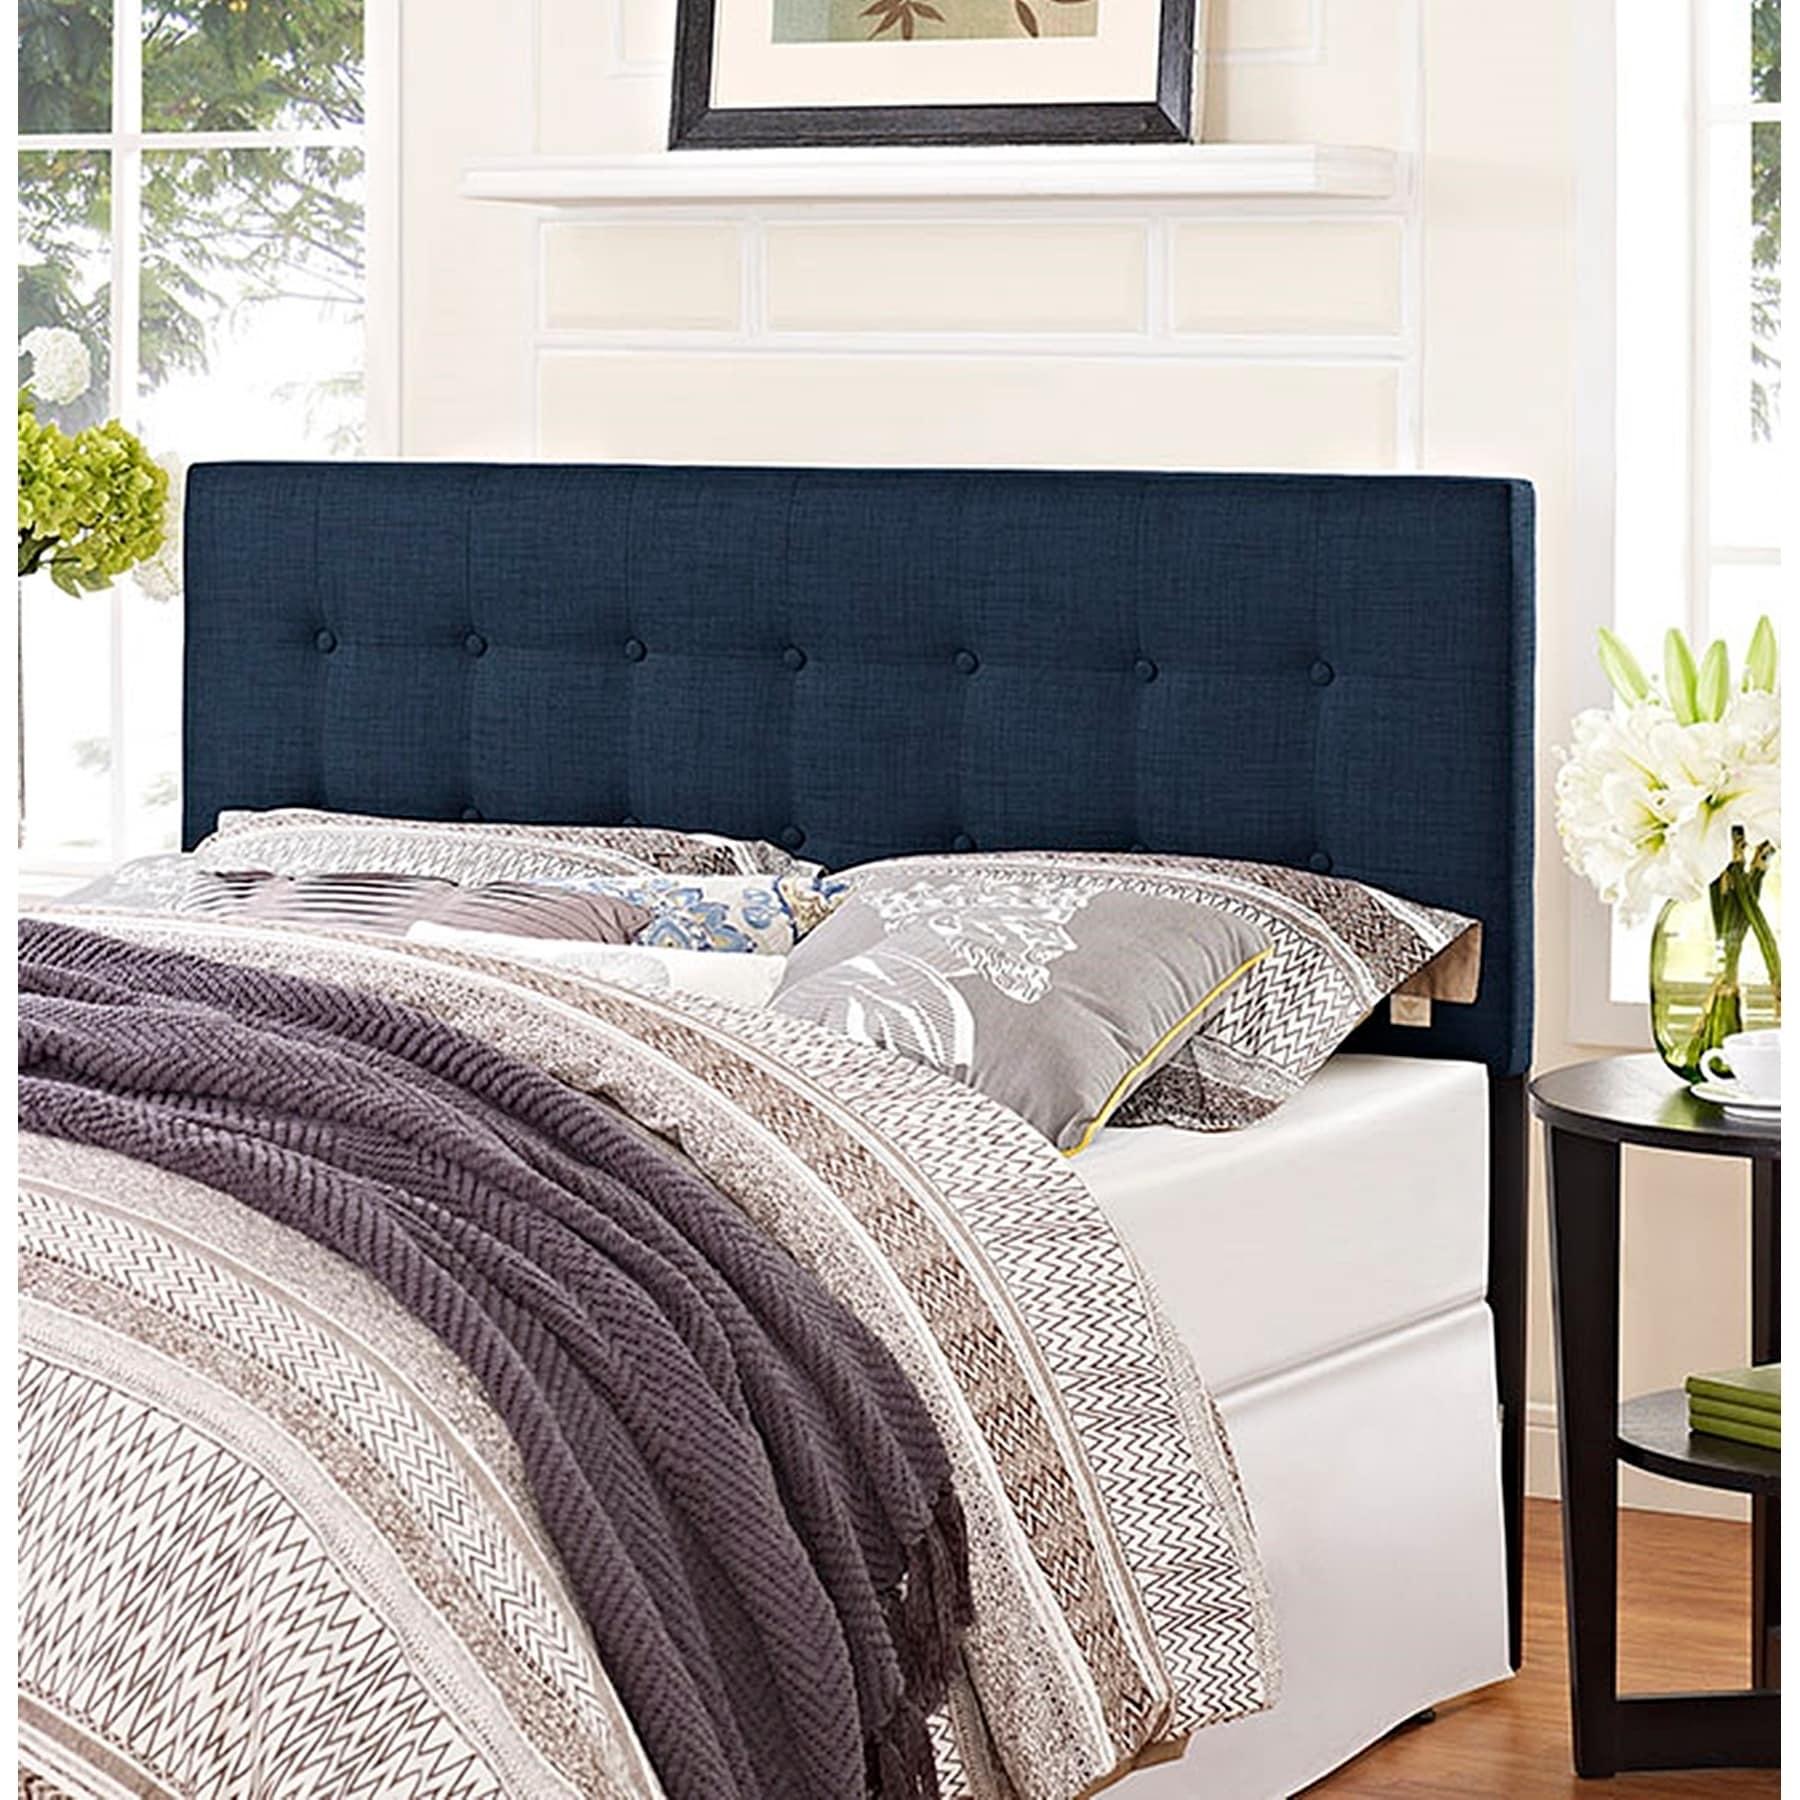 Shop Hixson Stylish Dark Blue Fabric Upholstered Full Size Headboard Overstock 22881216